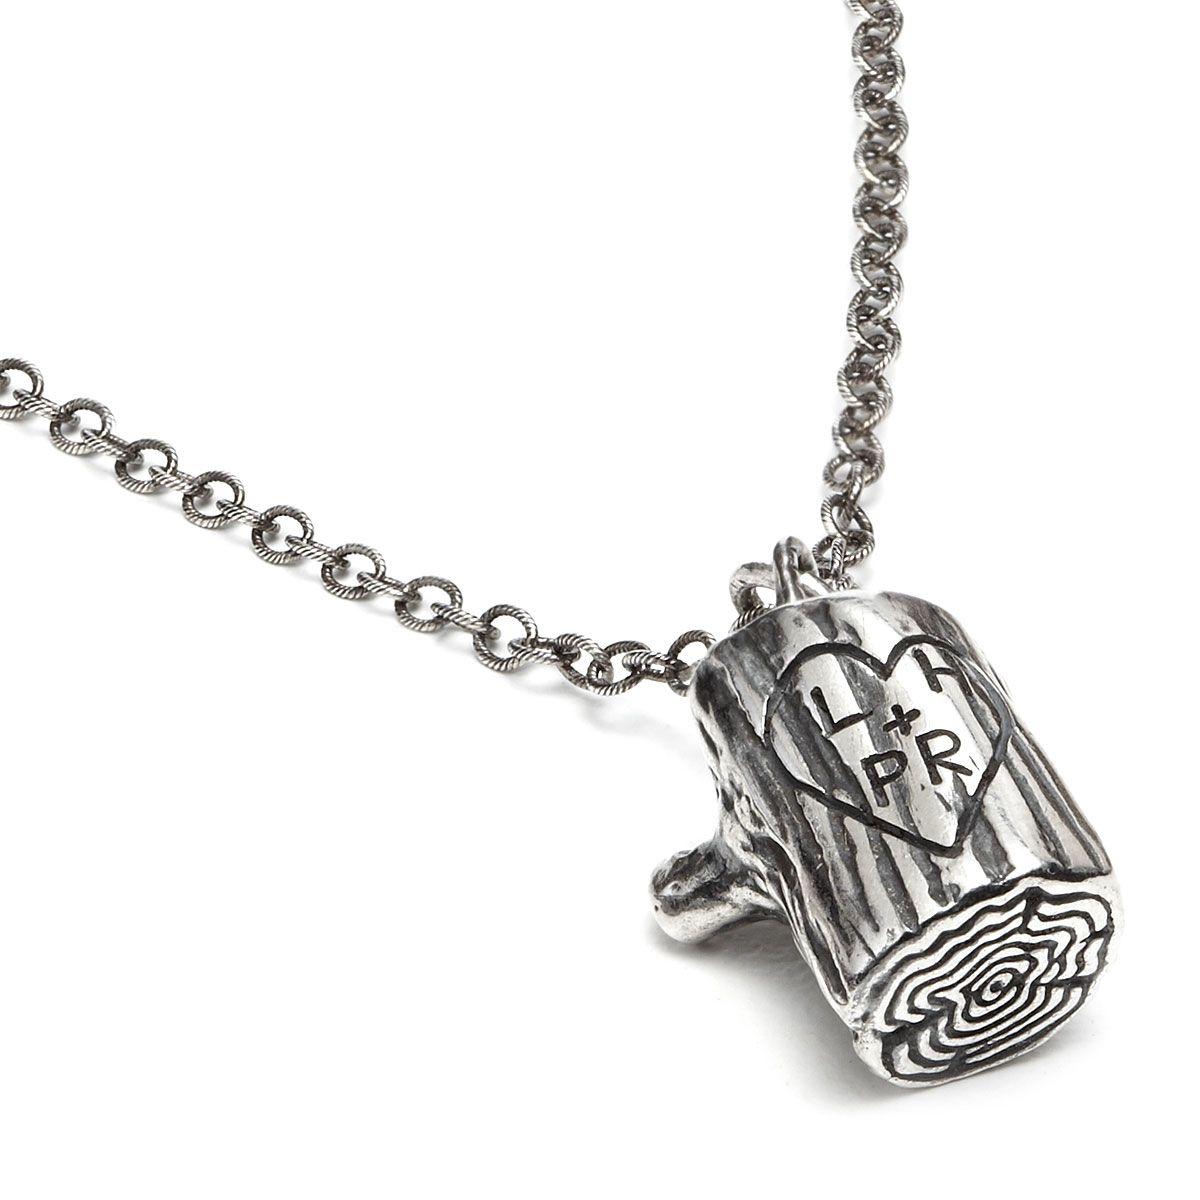 Heart silver pendant by Ruff